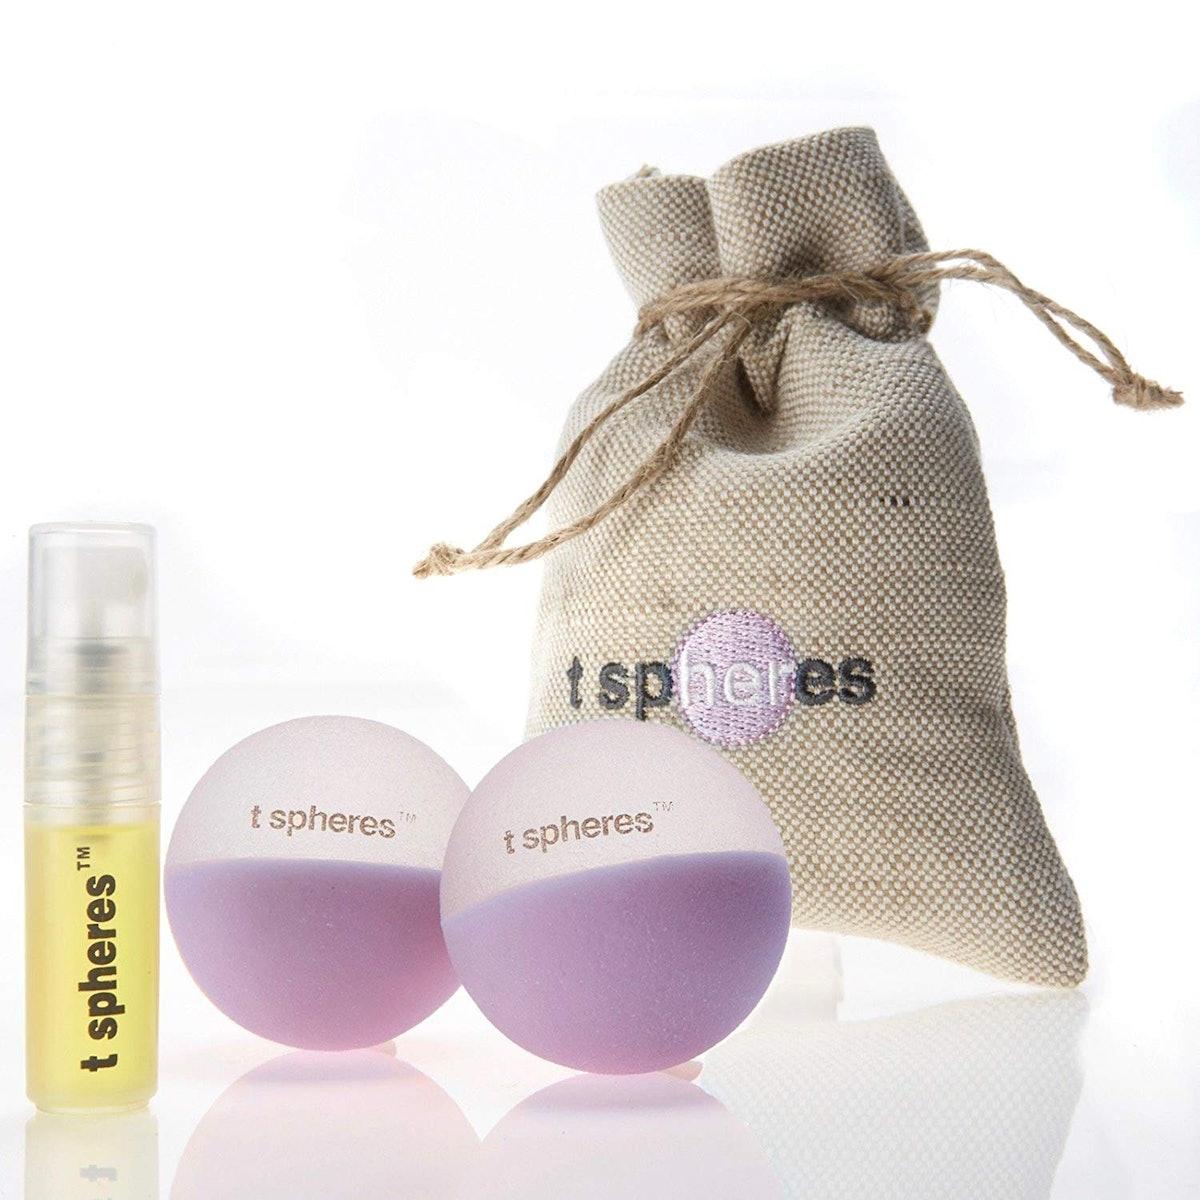 T Spheres Aromatherapy Massage Balls